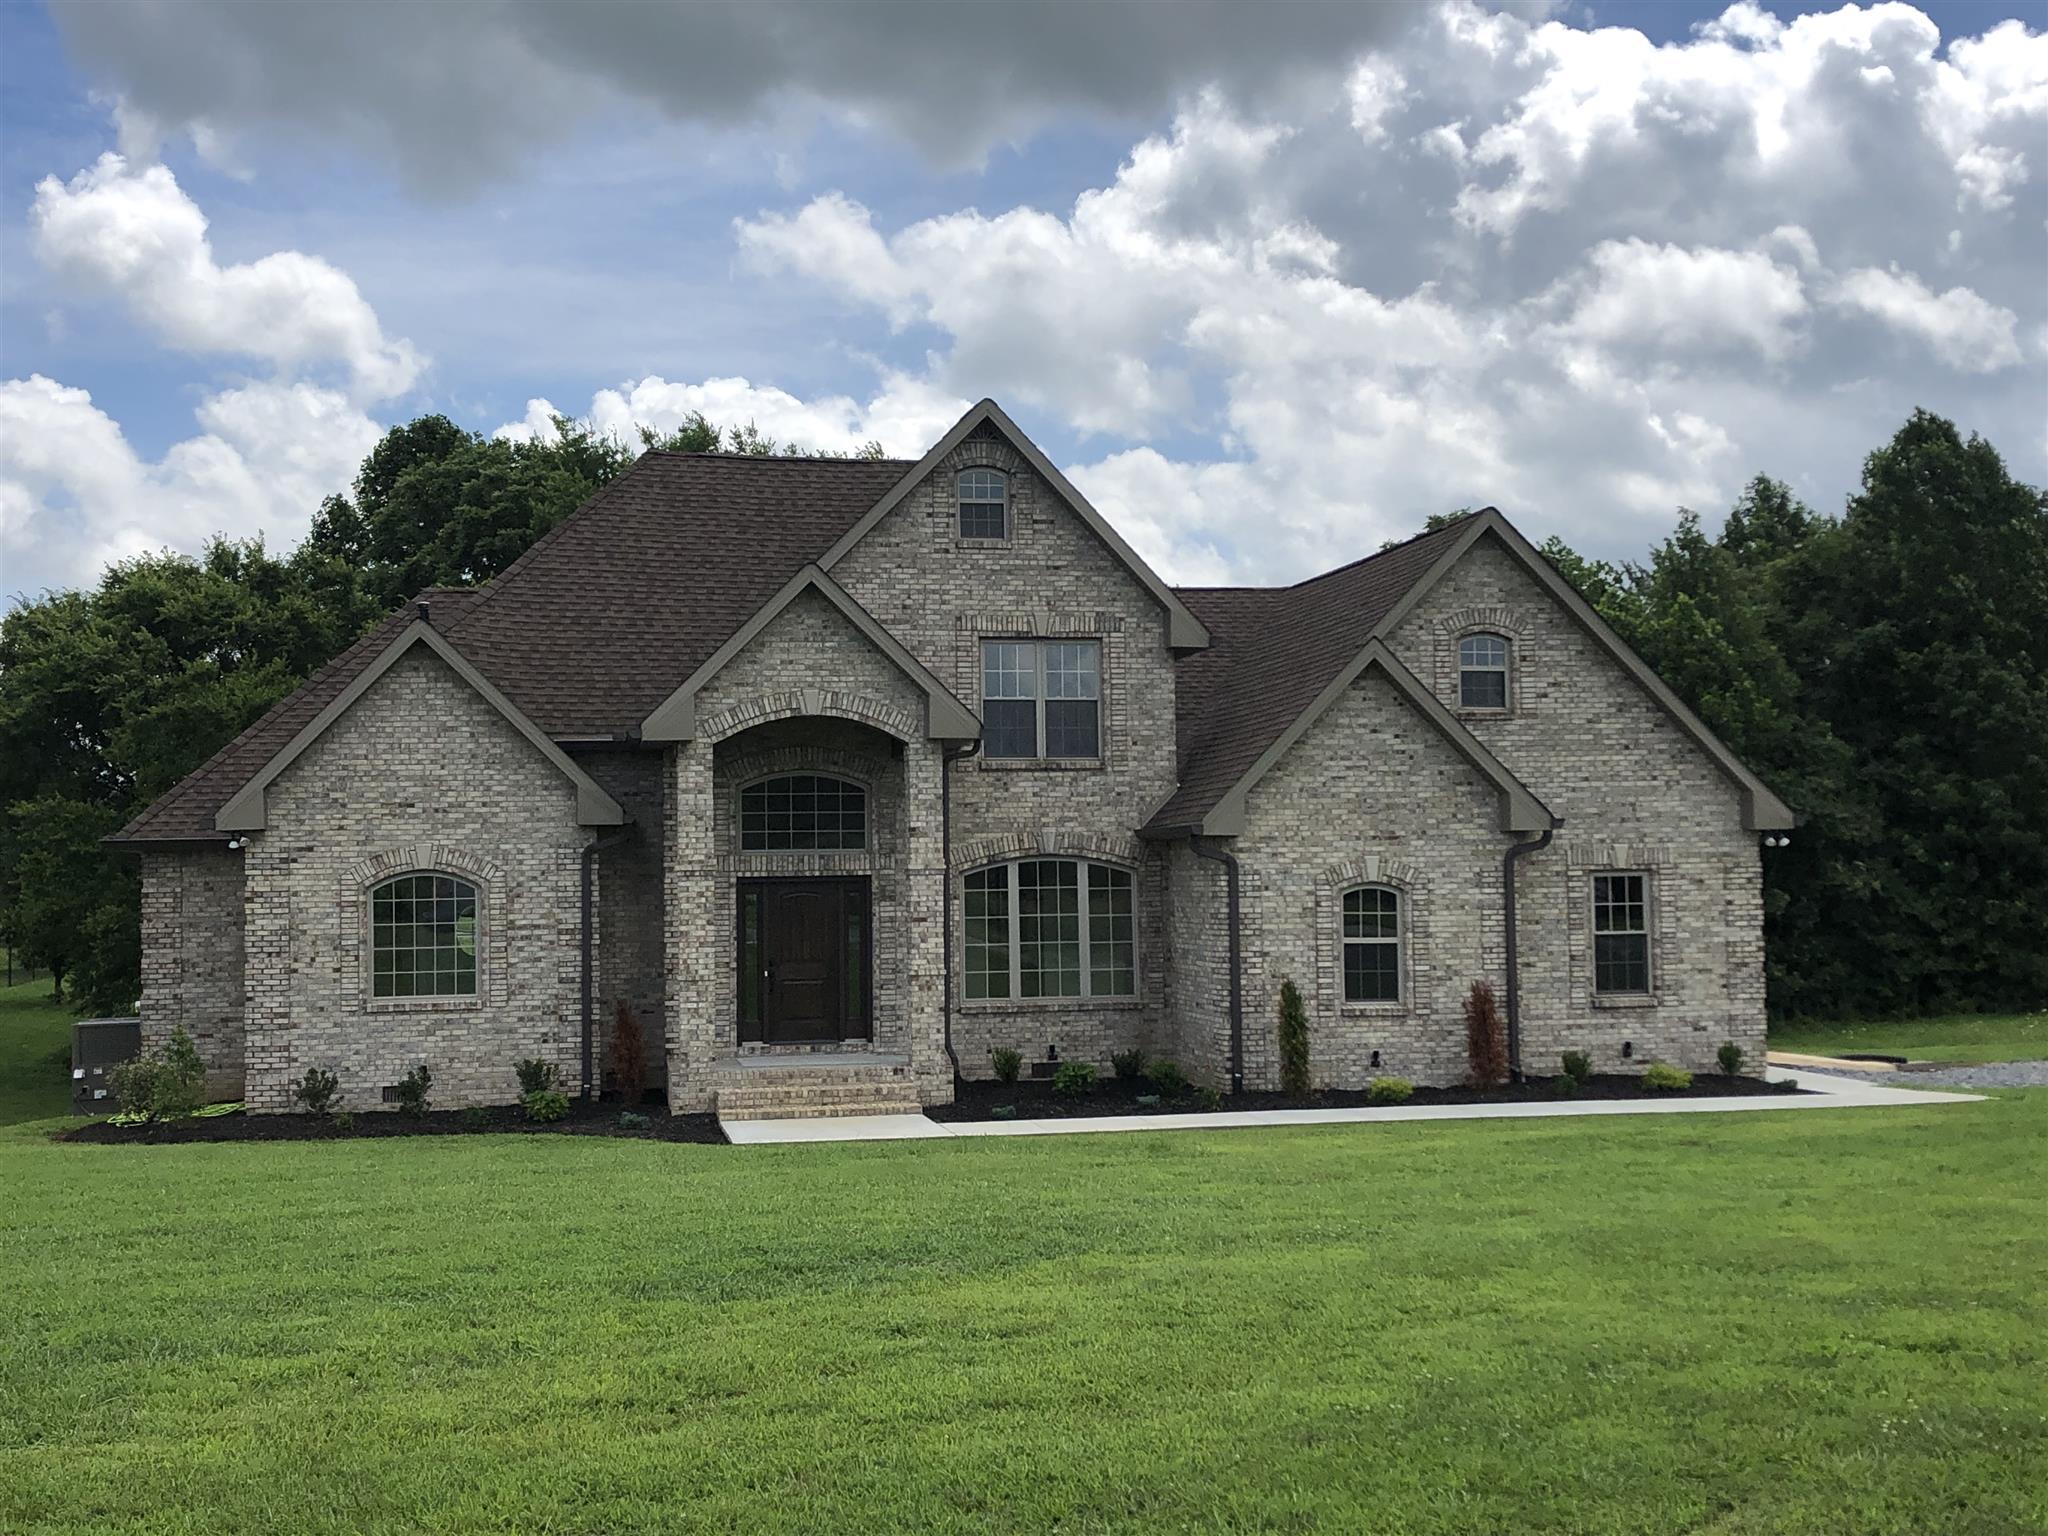 93 Robert Elmore Ln, Lafayette, TN 37083 - Lafayette, TN real estate listing